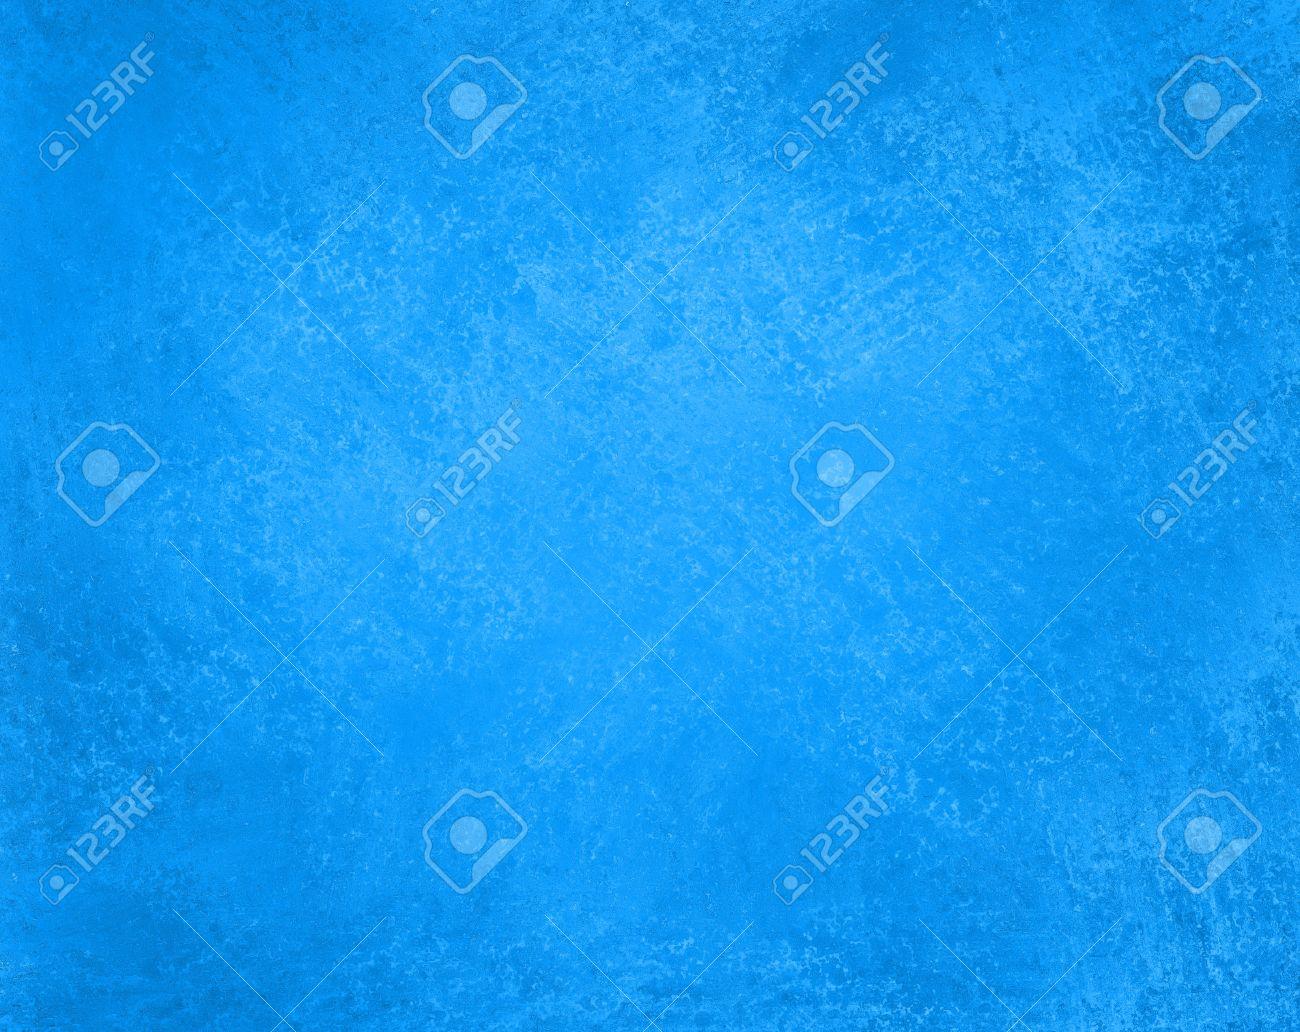 abstract sky blue background color with sponge vintage grunge